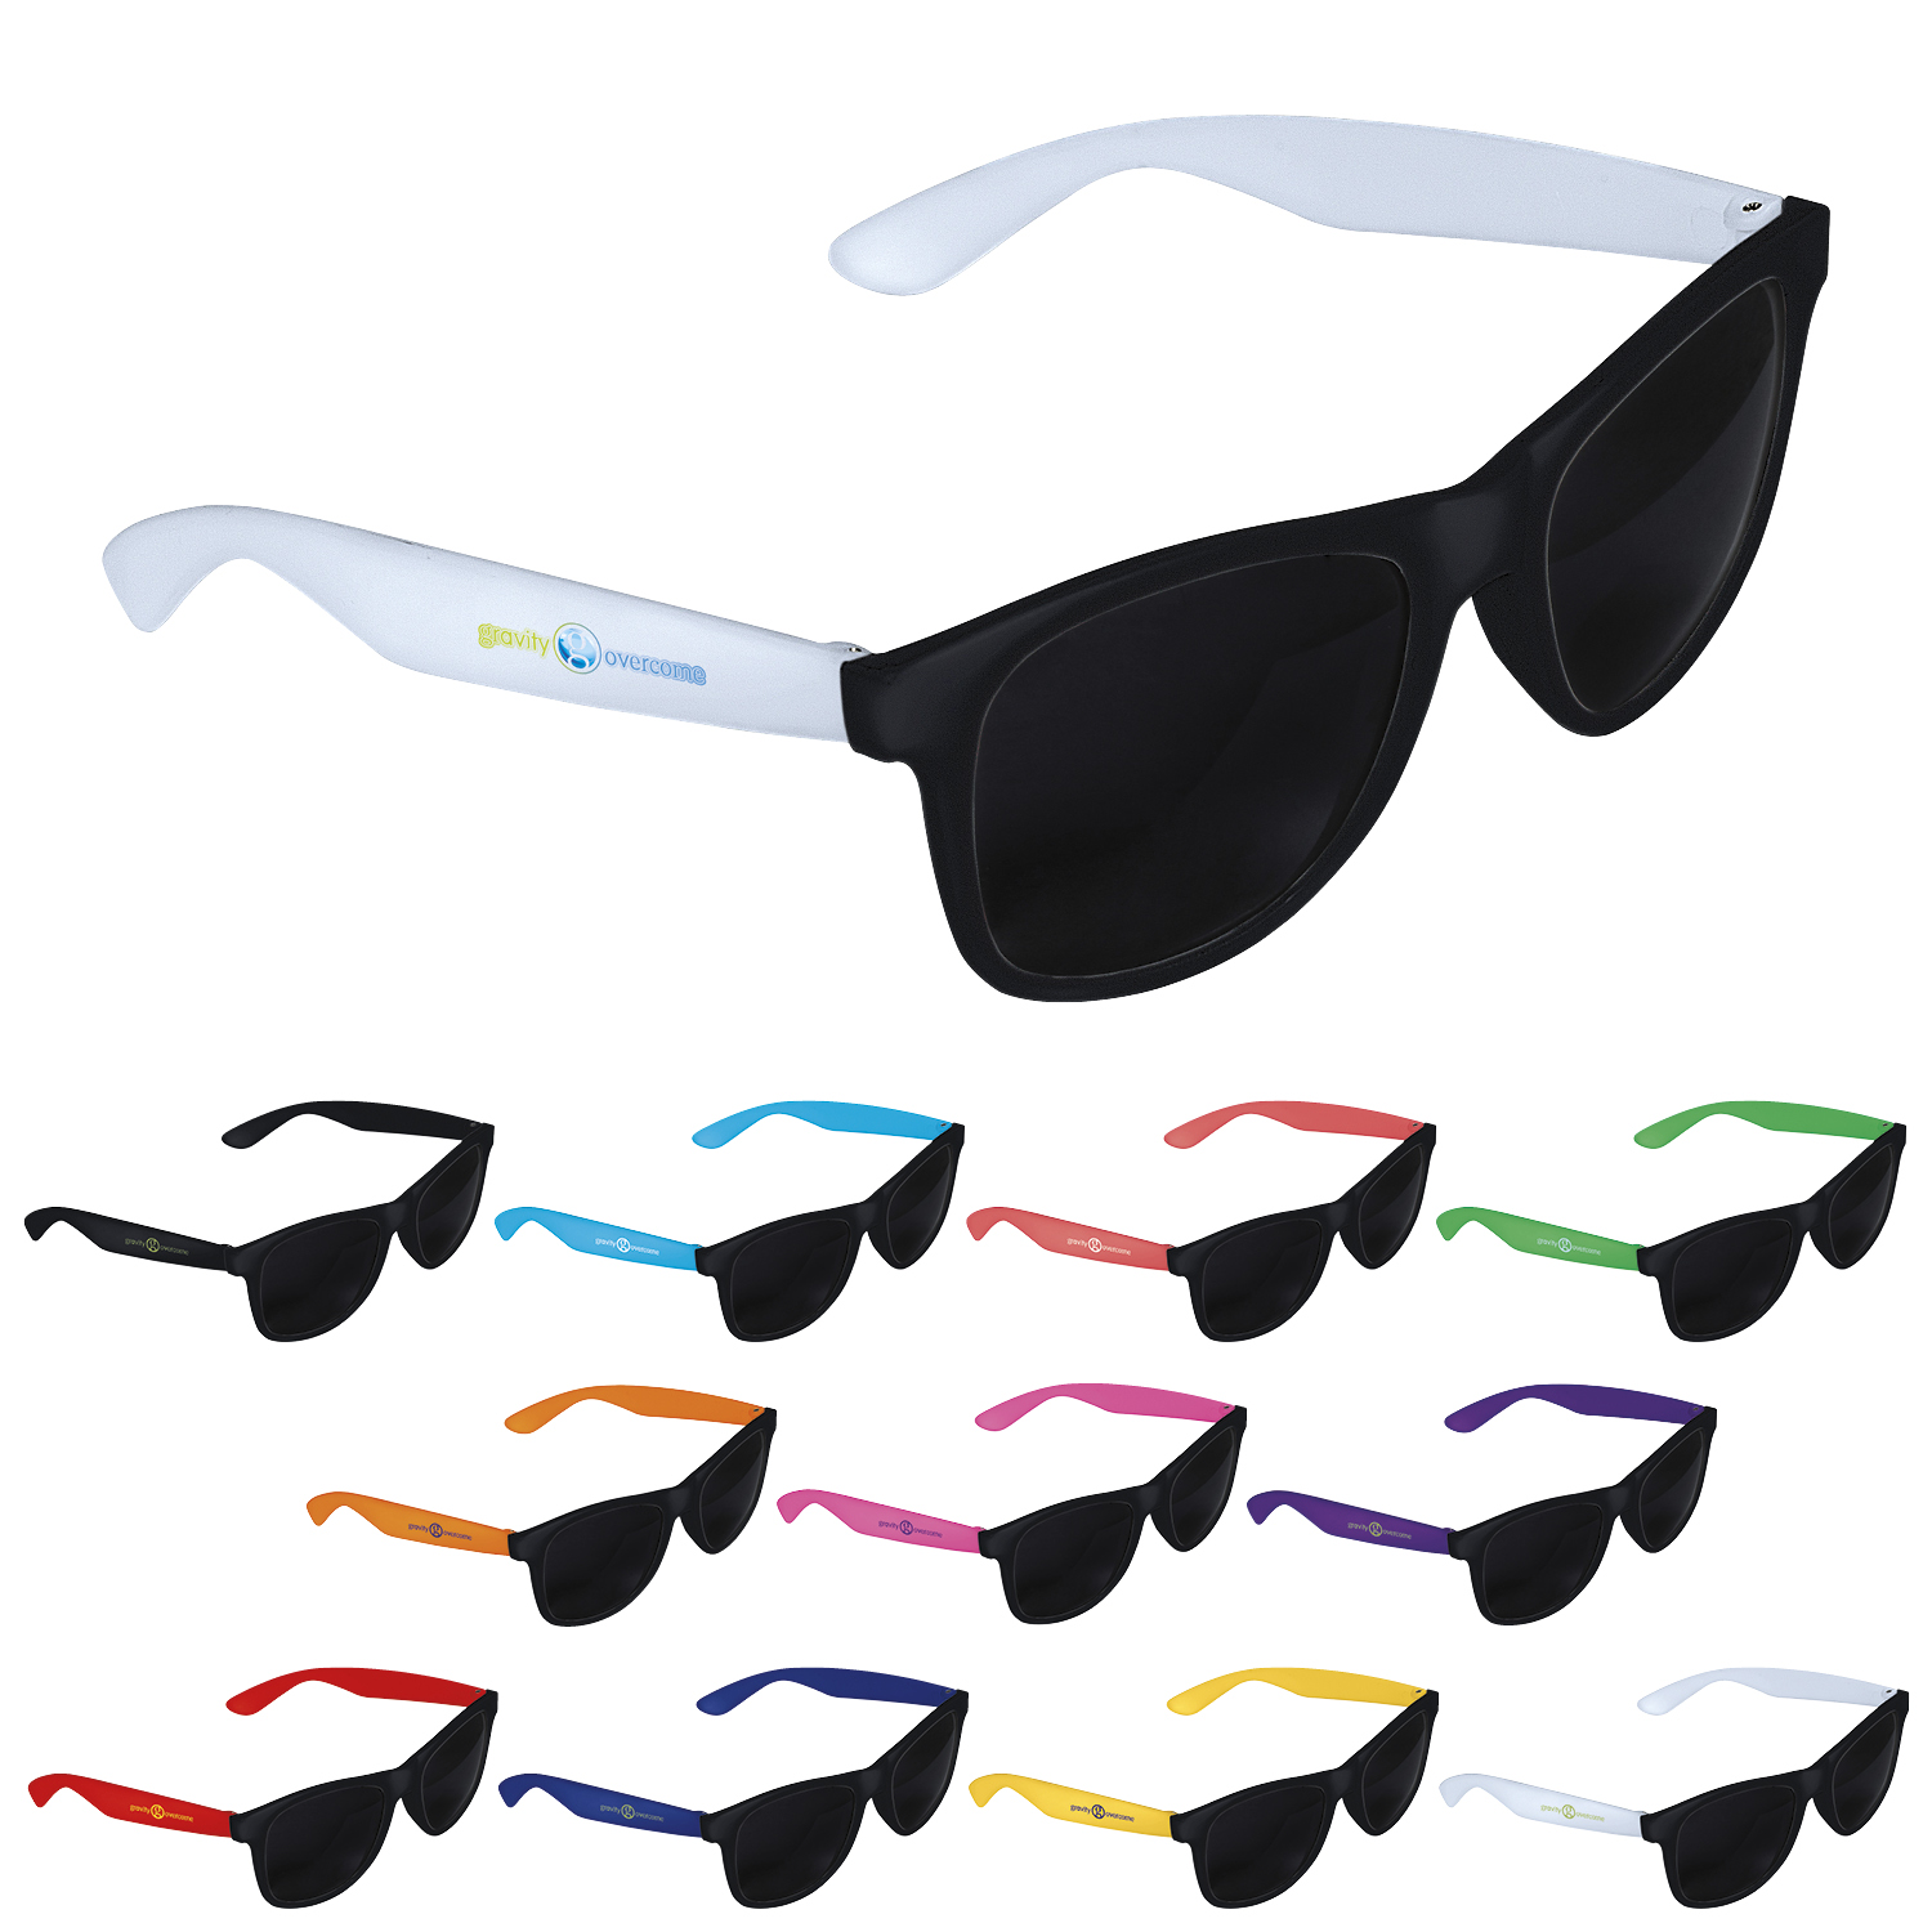 GoodValue Two-Tone Black Frame Sunglasses, #26045, 1 Colour Imprint